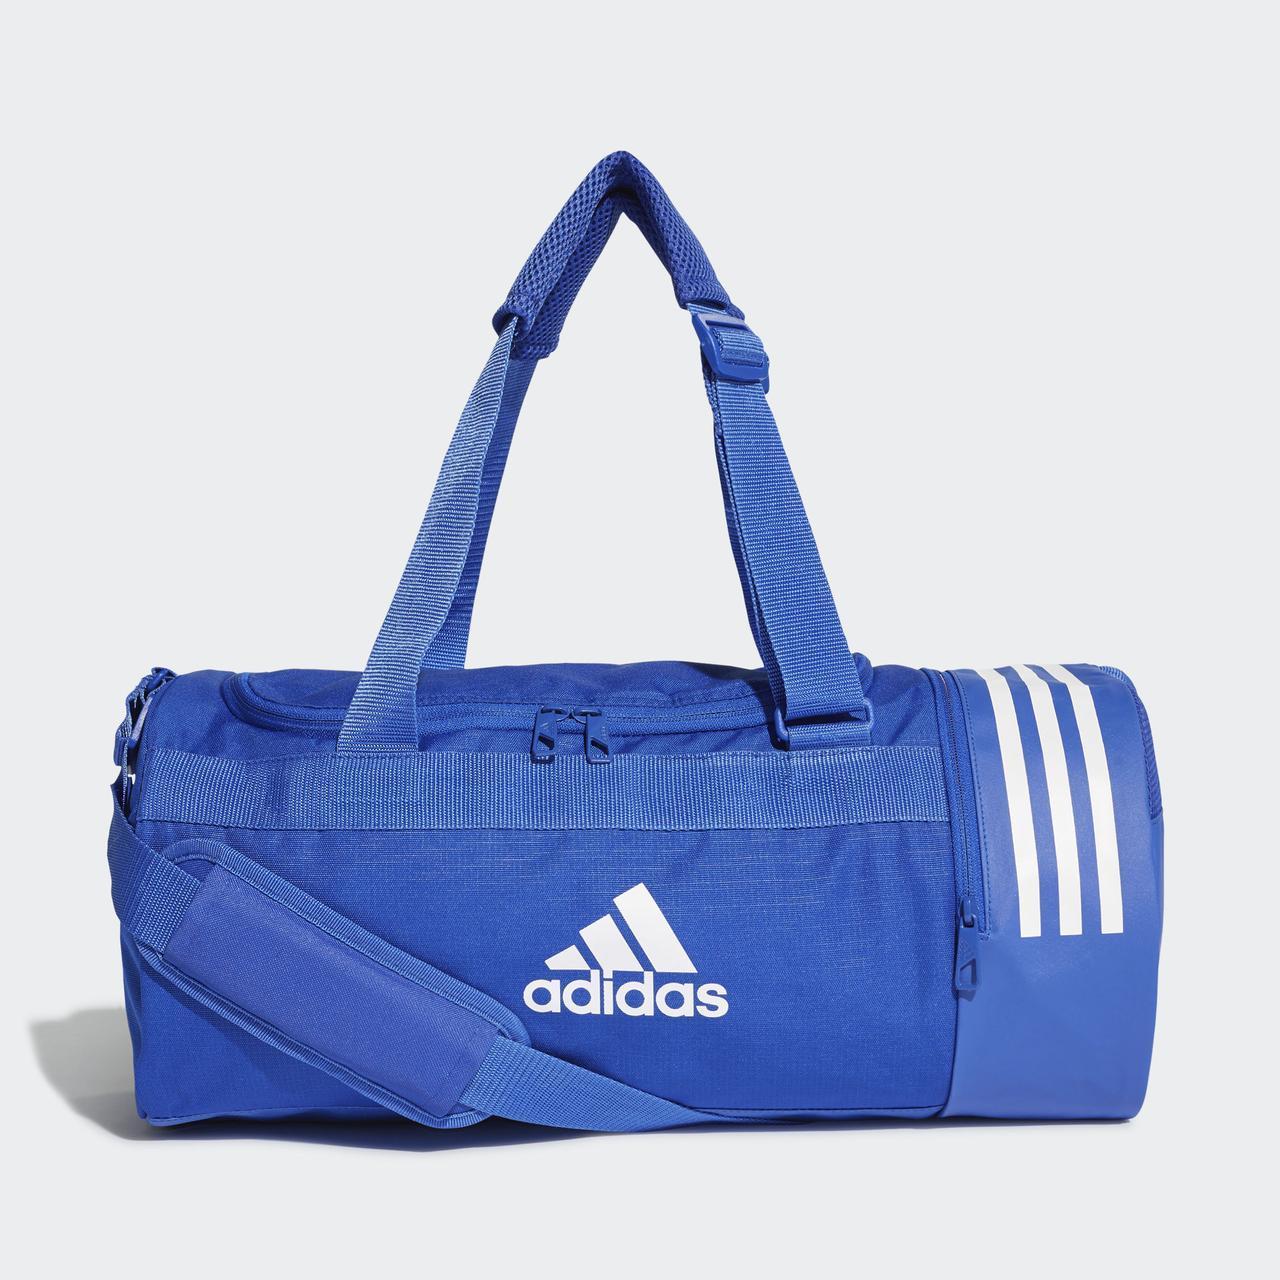 8ed5e582a71c Спортивная сумка-трансформер Adidas Convertible 3-Stripes DT8646 - 2019